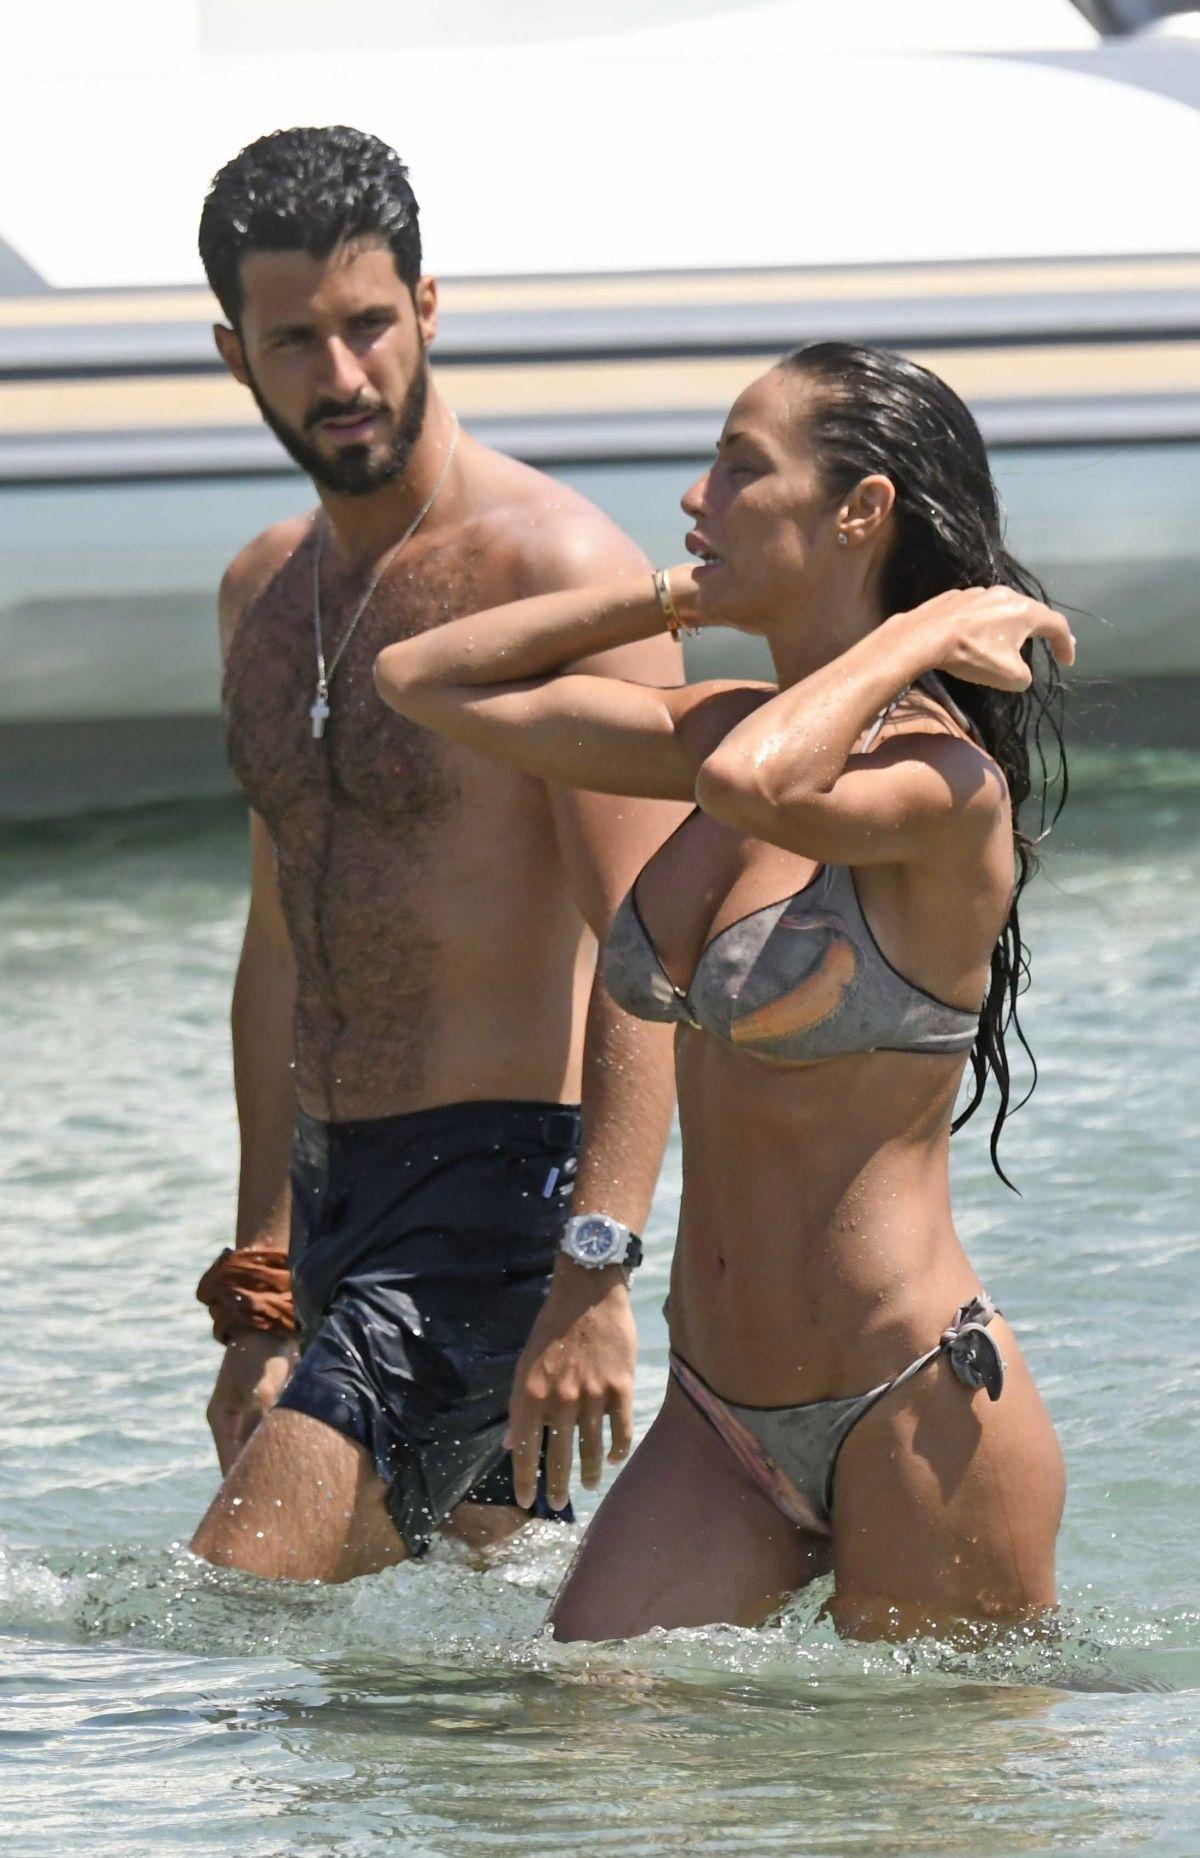 Raffaella Fico Bikini Beach Greece